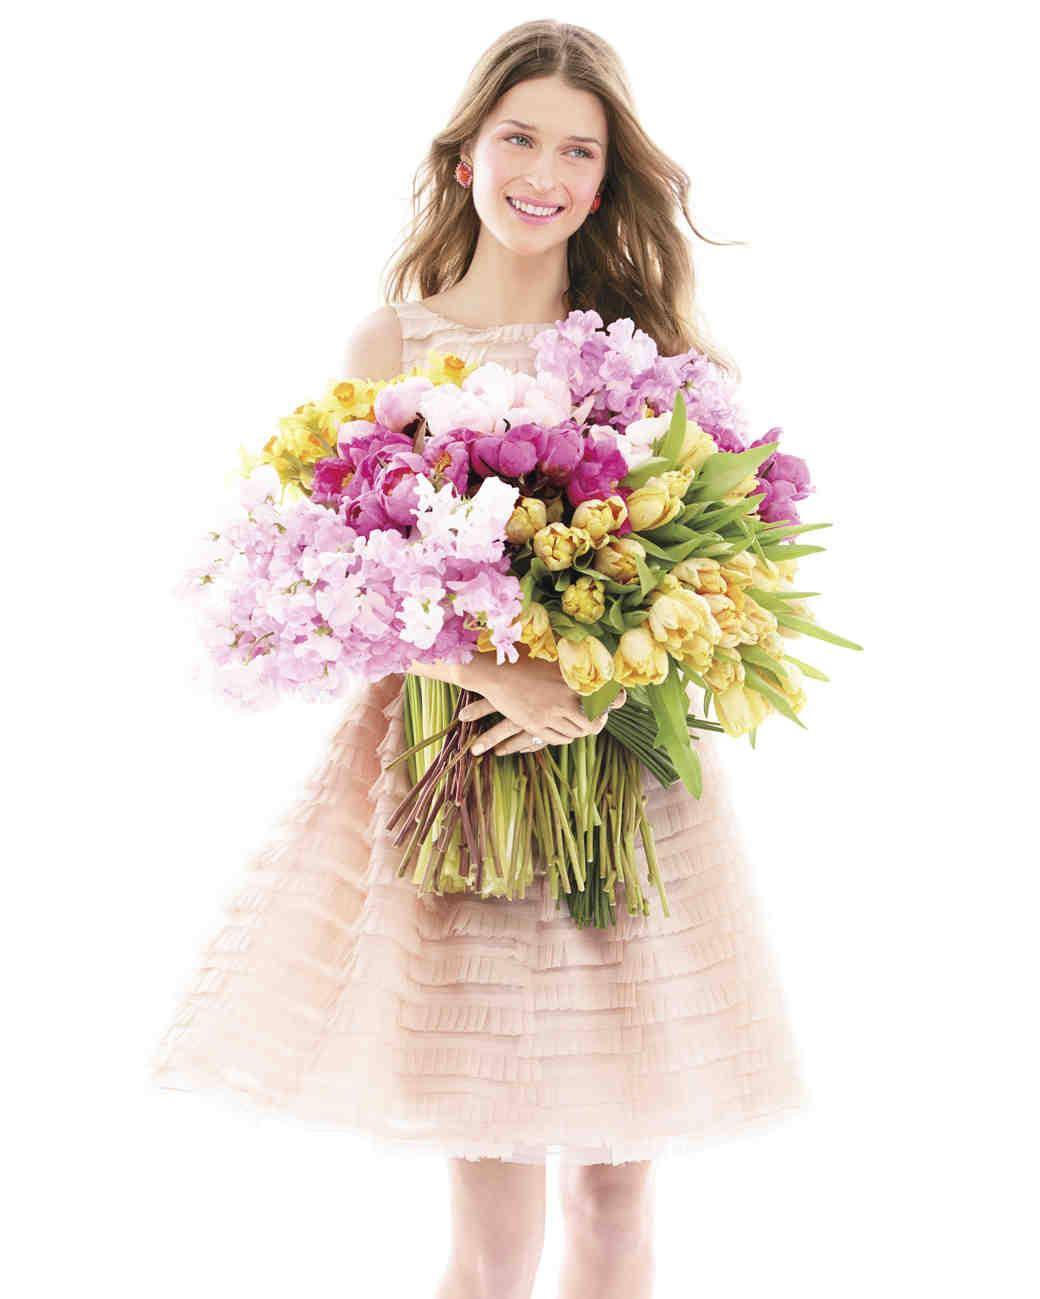 flowers-059-d111904.jpg